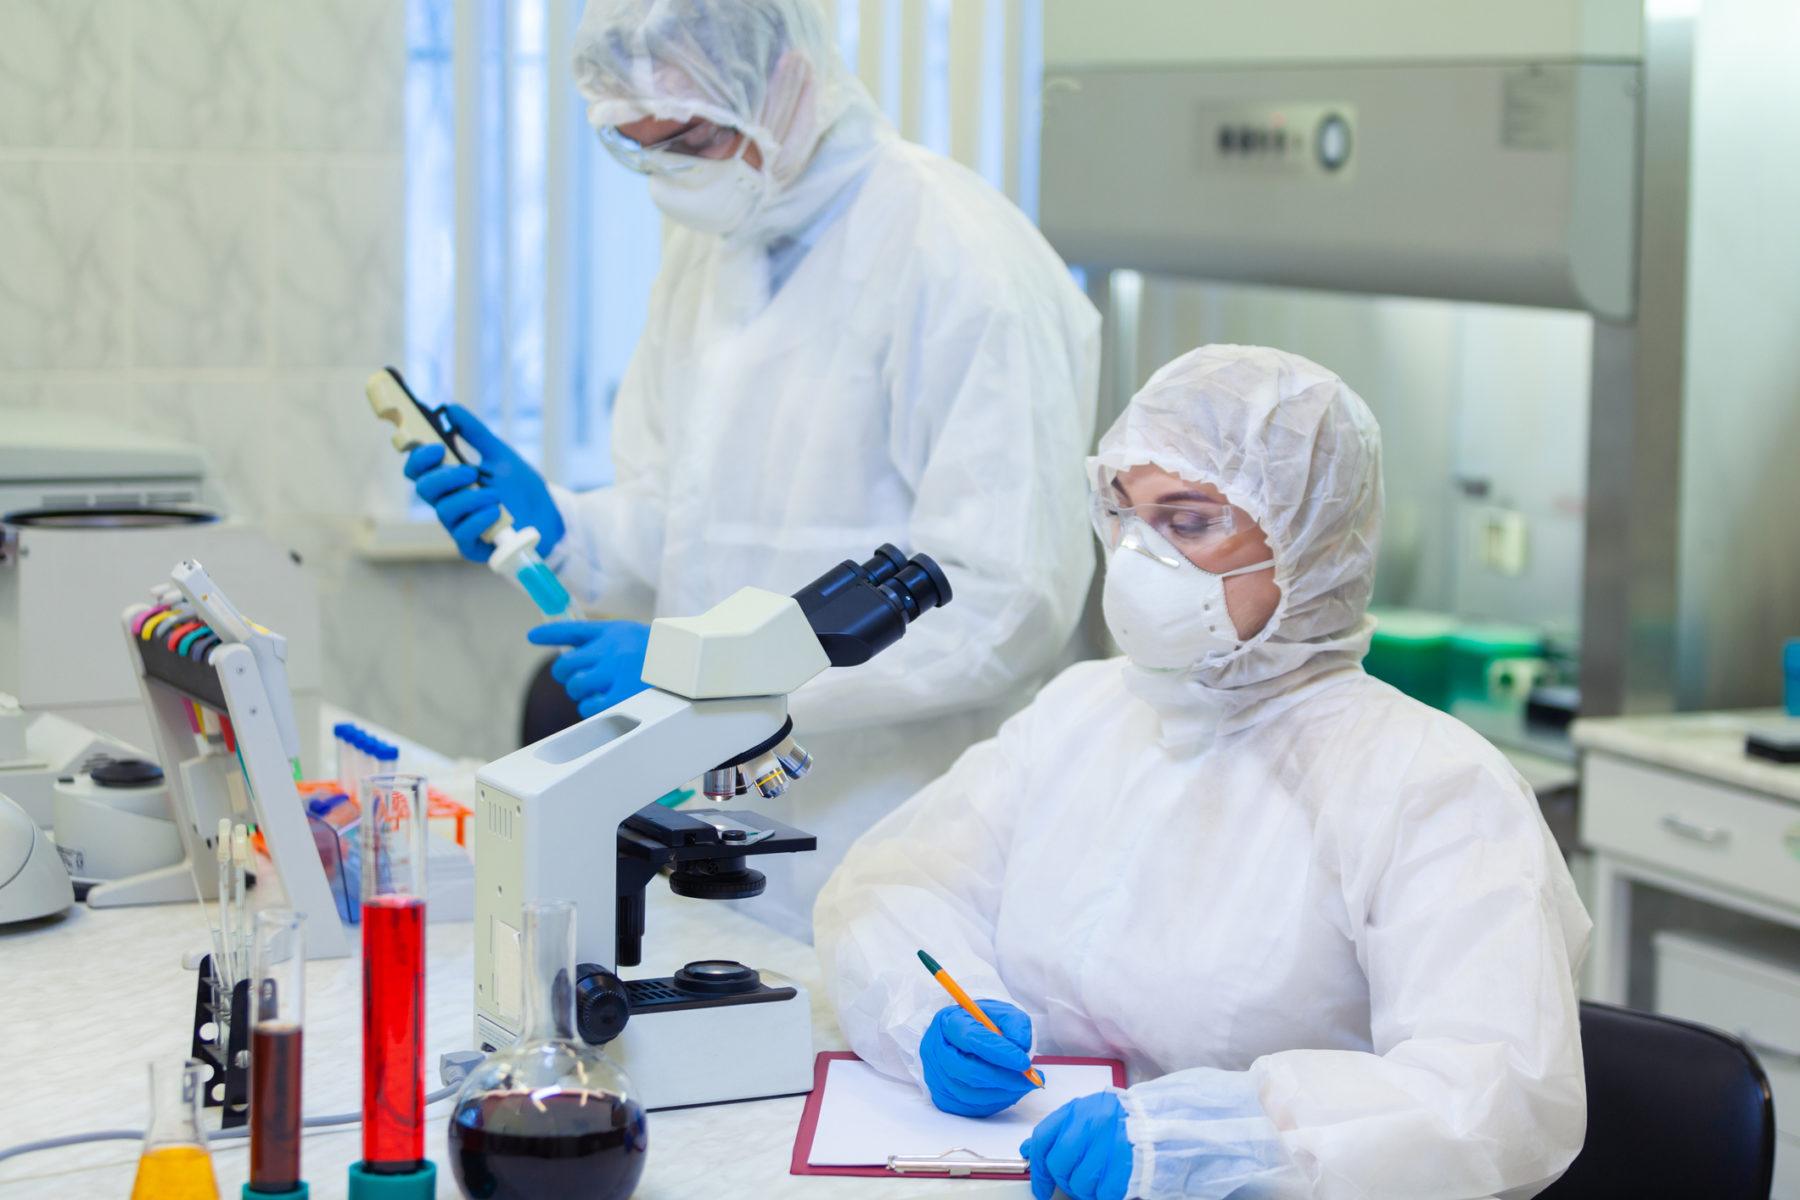 FITSNews – South Carolina's Embarrassingly Anemic Coronavirus Testing